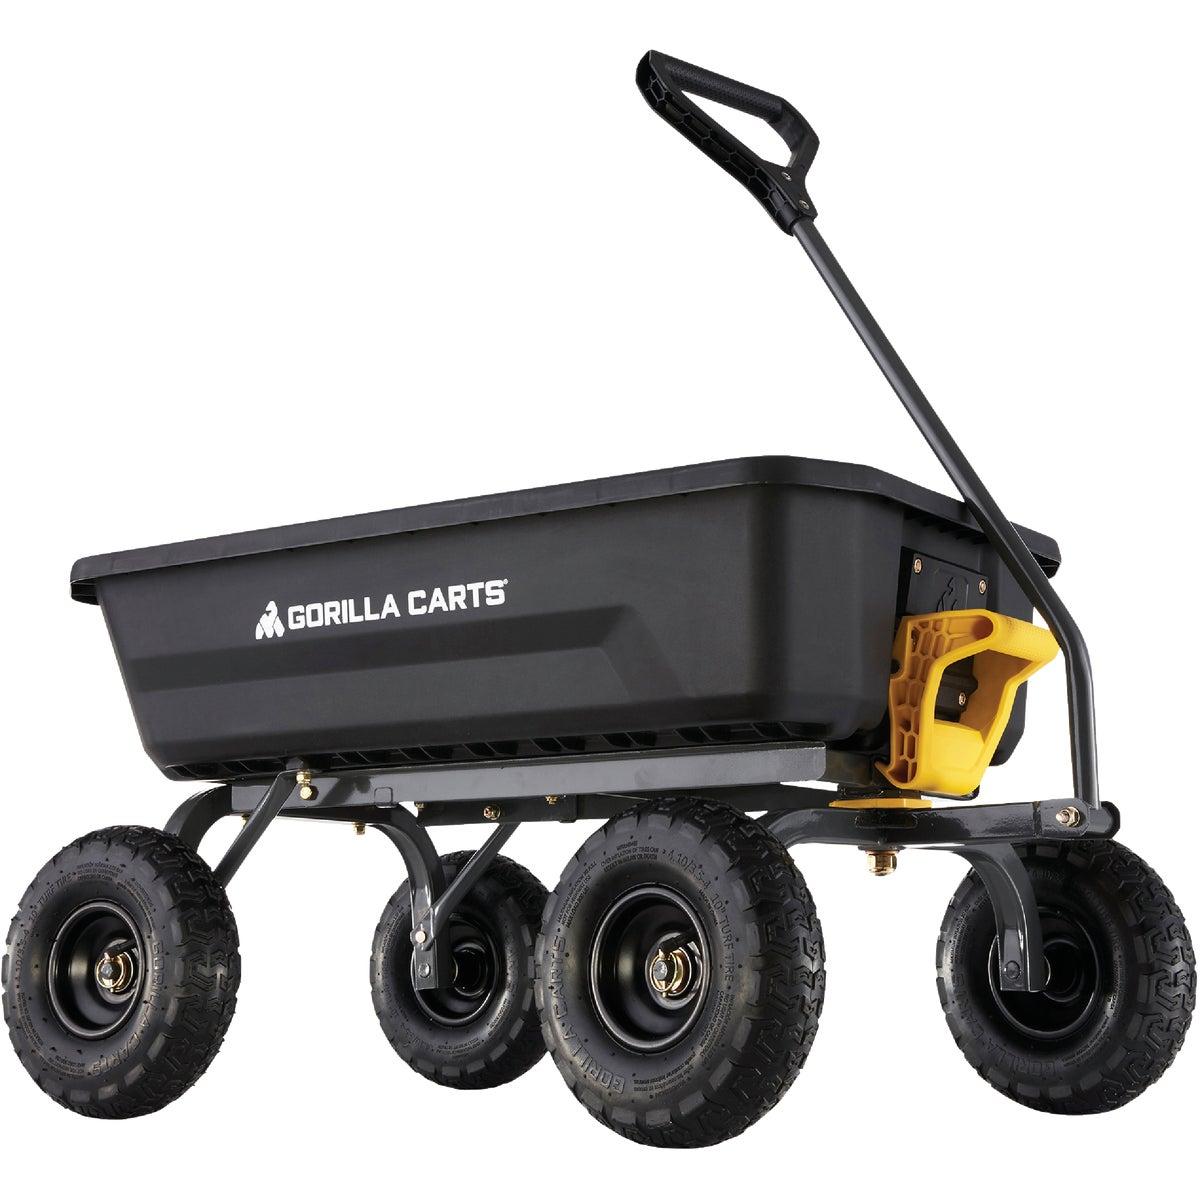 Gorilla Carts GOR200B Poly Garden Dump Cart with Steel Frame and 10-Inch Pneu...